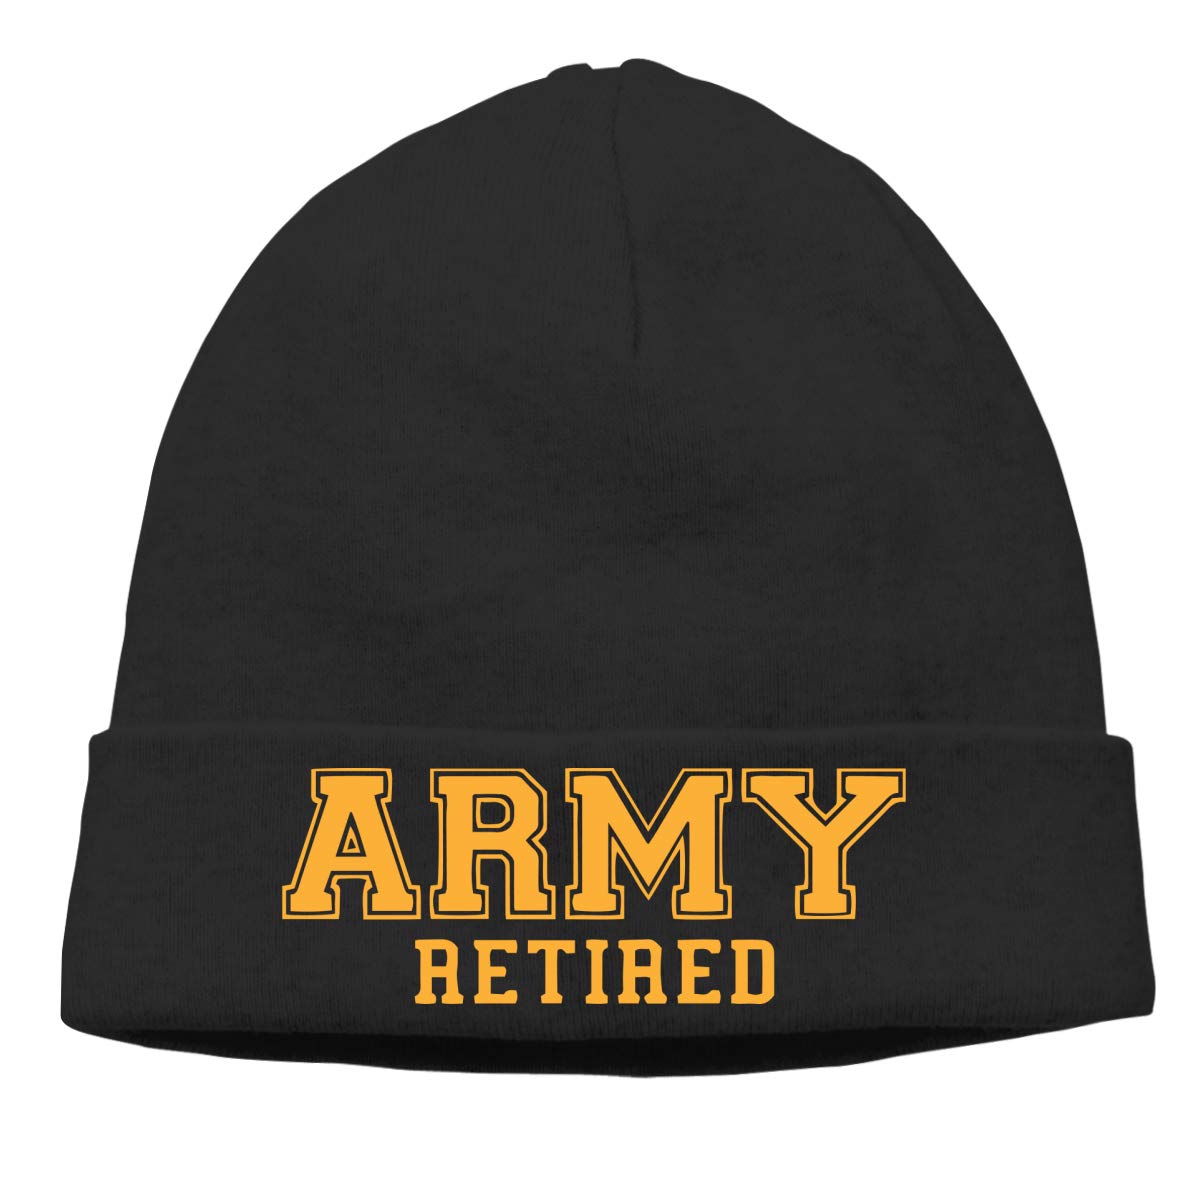 Nskngr Army Retired Cap Men Women Warm /& Stylish Serious Beanies Winter Hats